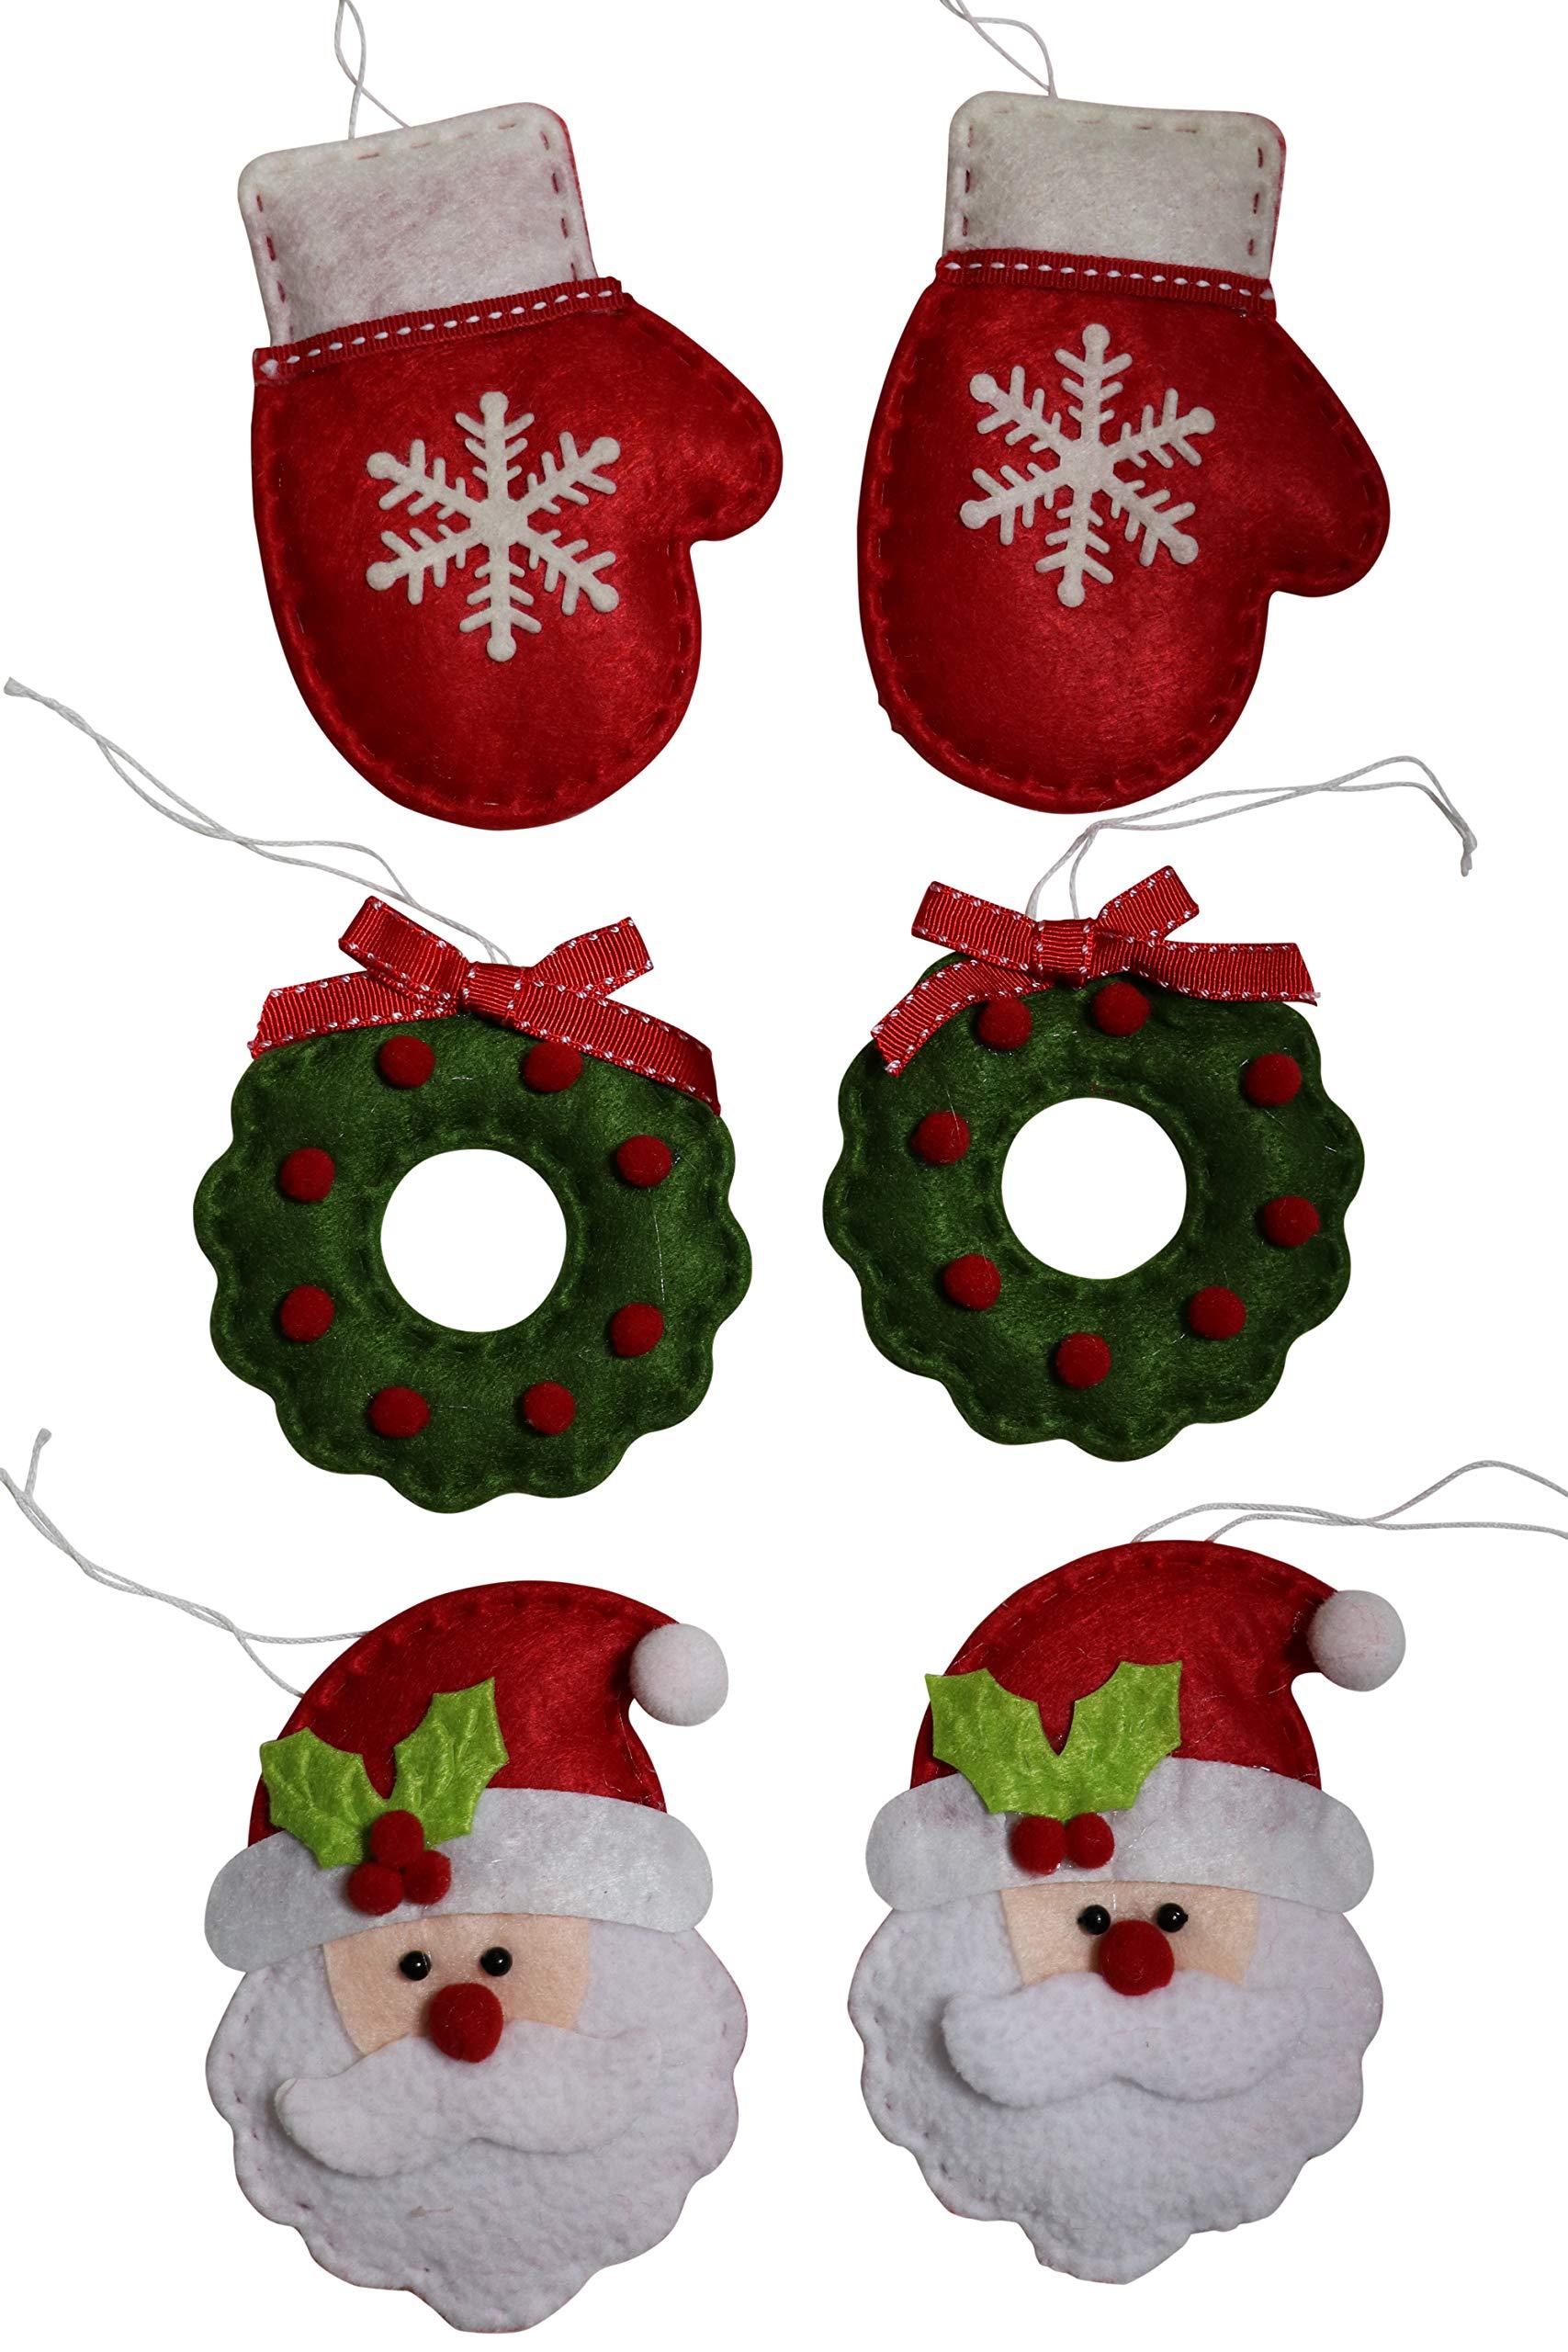 Image of Felt Christmas Tree Ornament Set